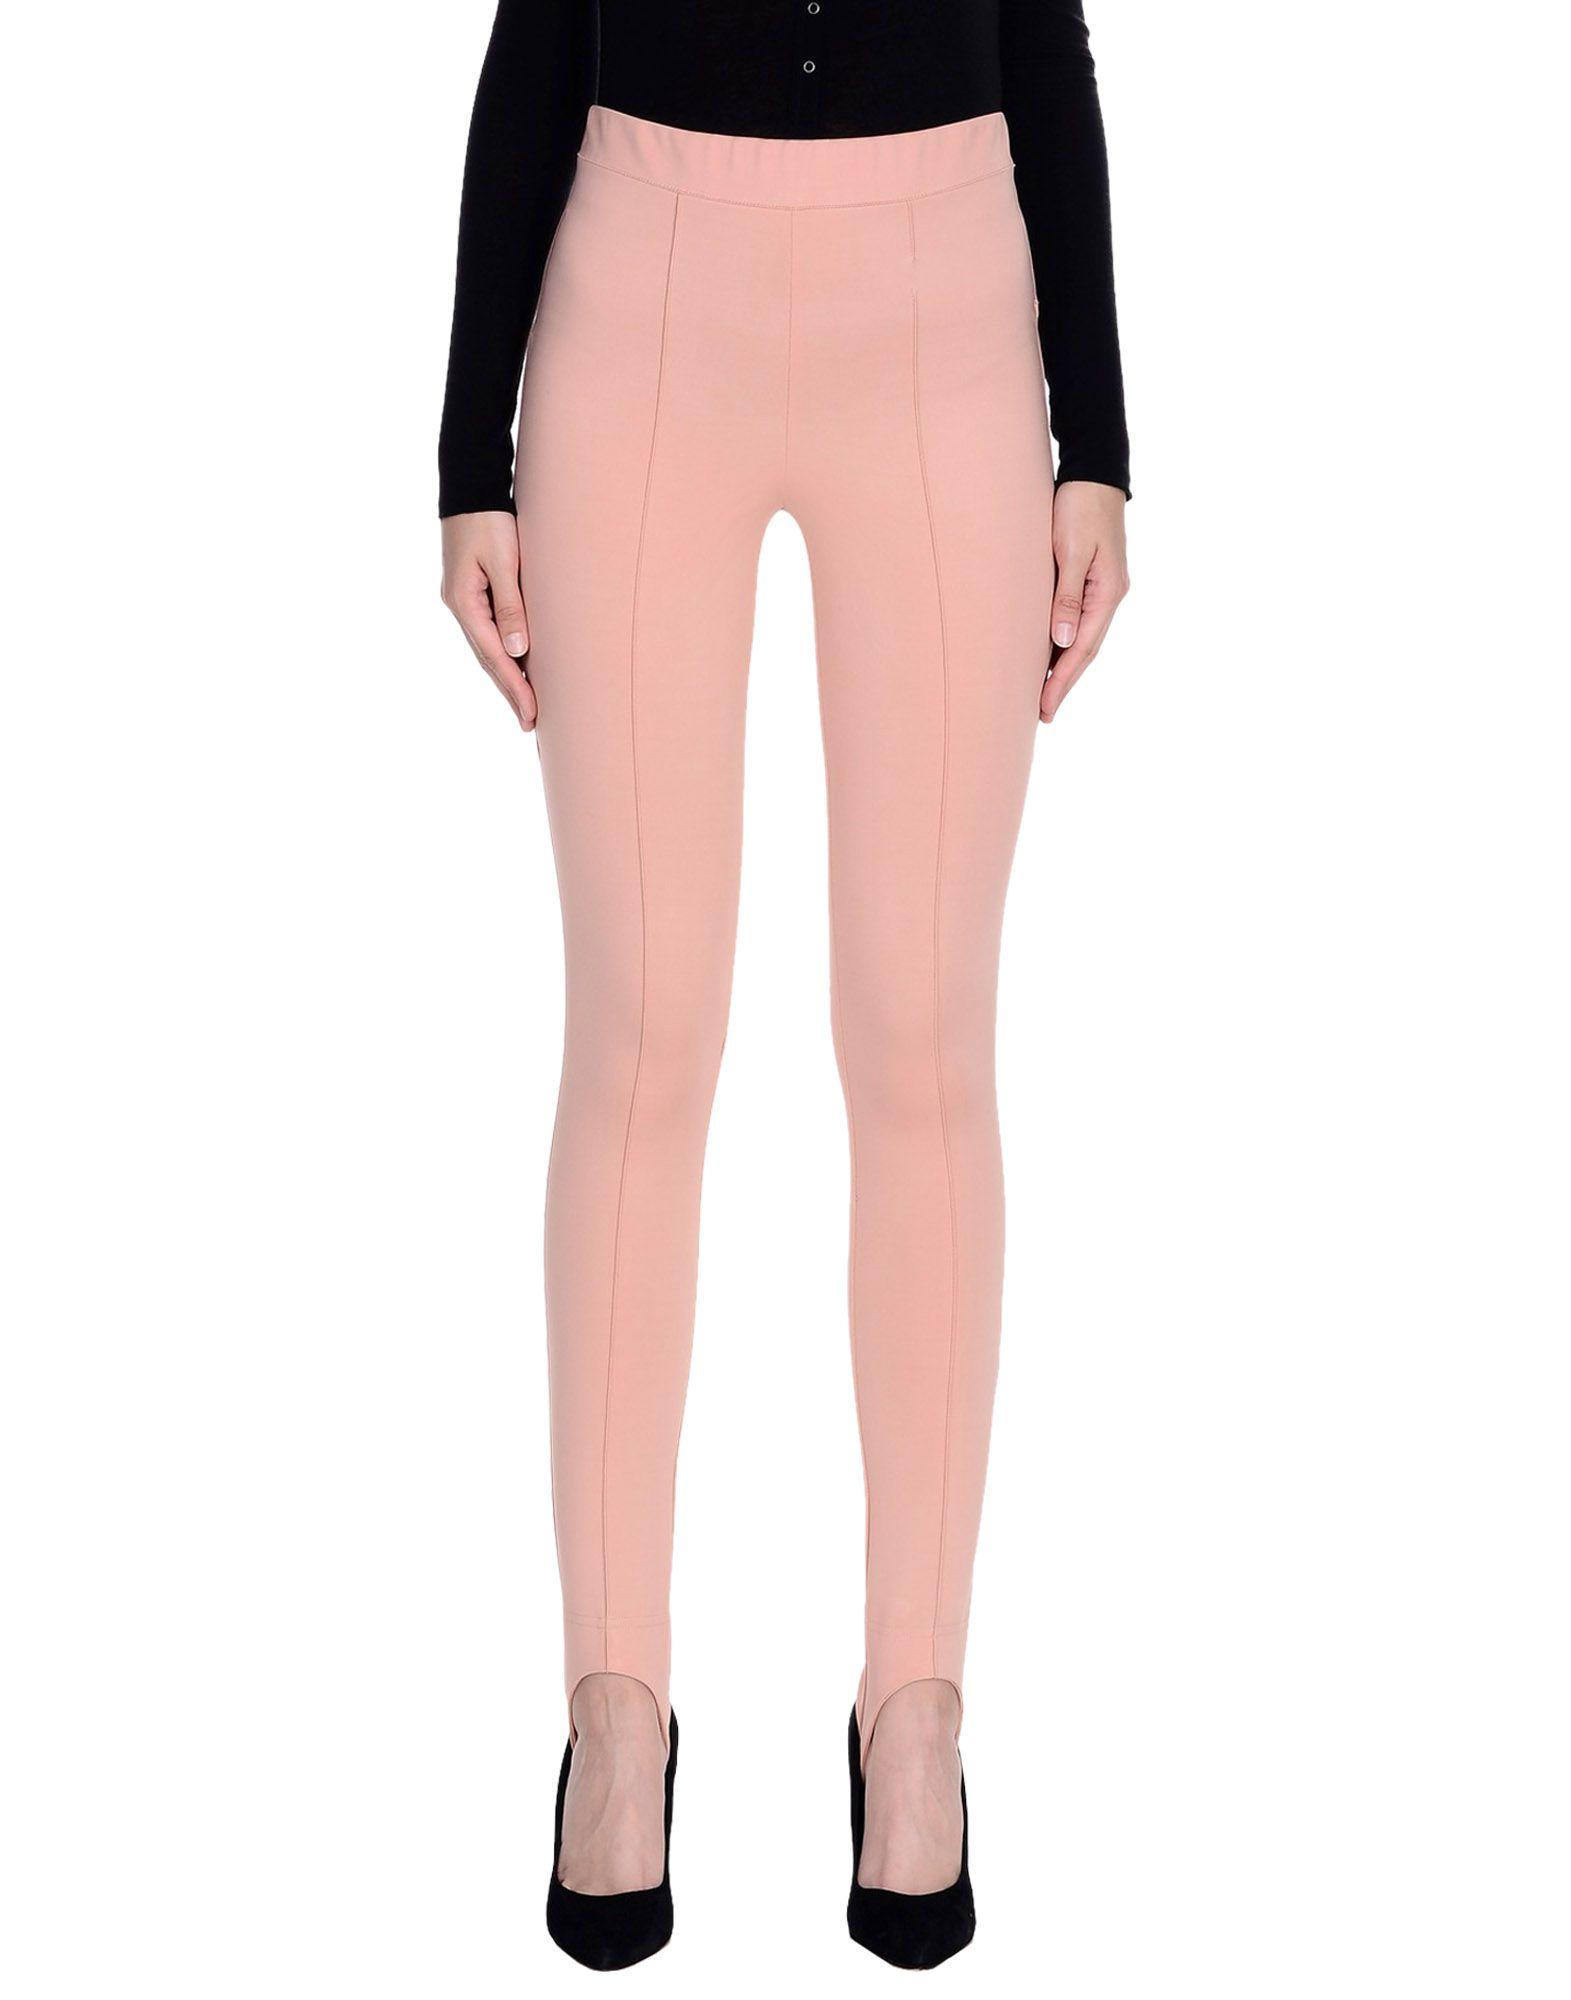 MARNI Leggings. Jersey No appliqués Solid color High waisted Slim fit Tapered leg Elasticized waist No pockets Stretch pants Large sized. 67% Viscose, 26% Polyamide, 7% Elastane